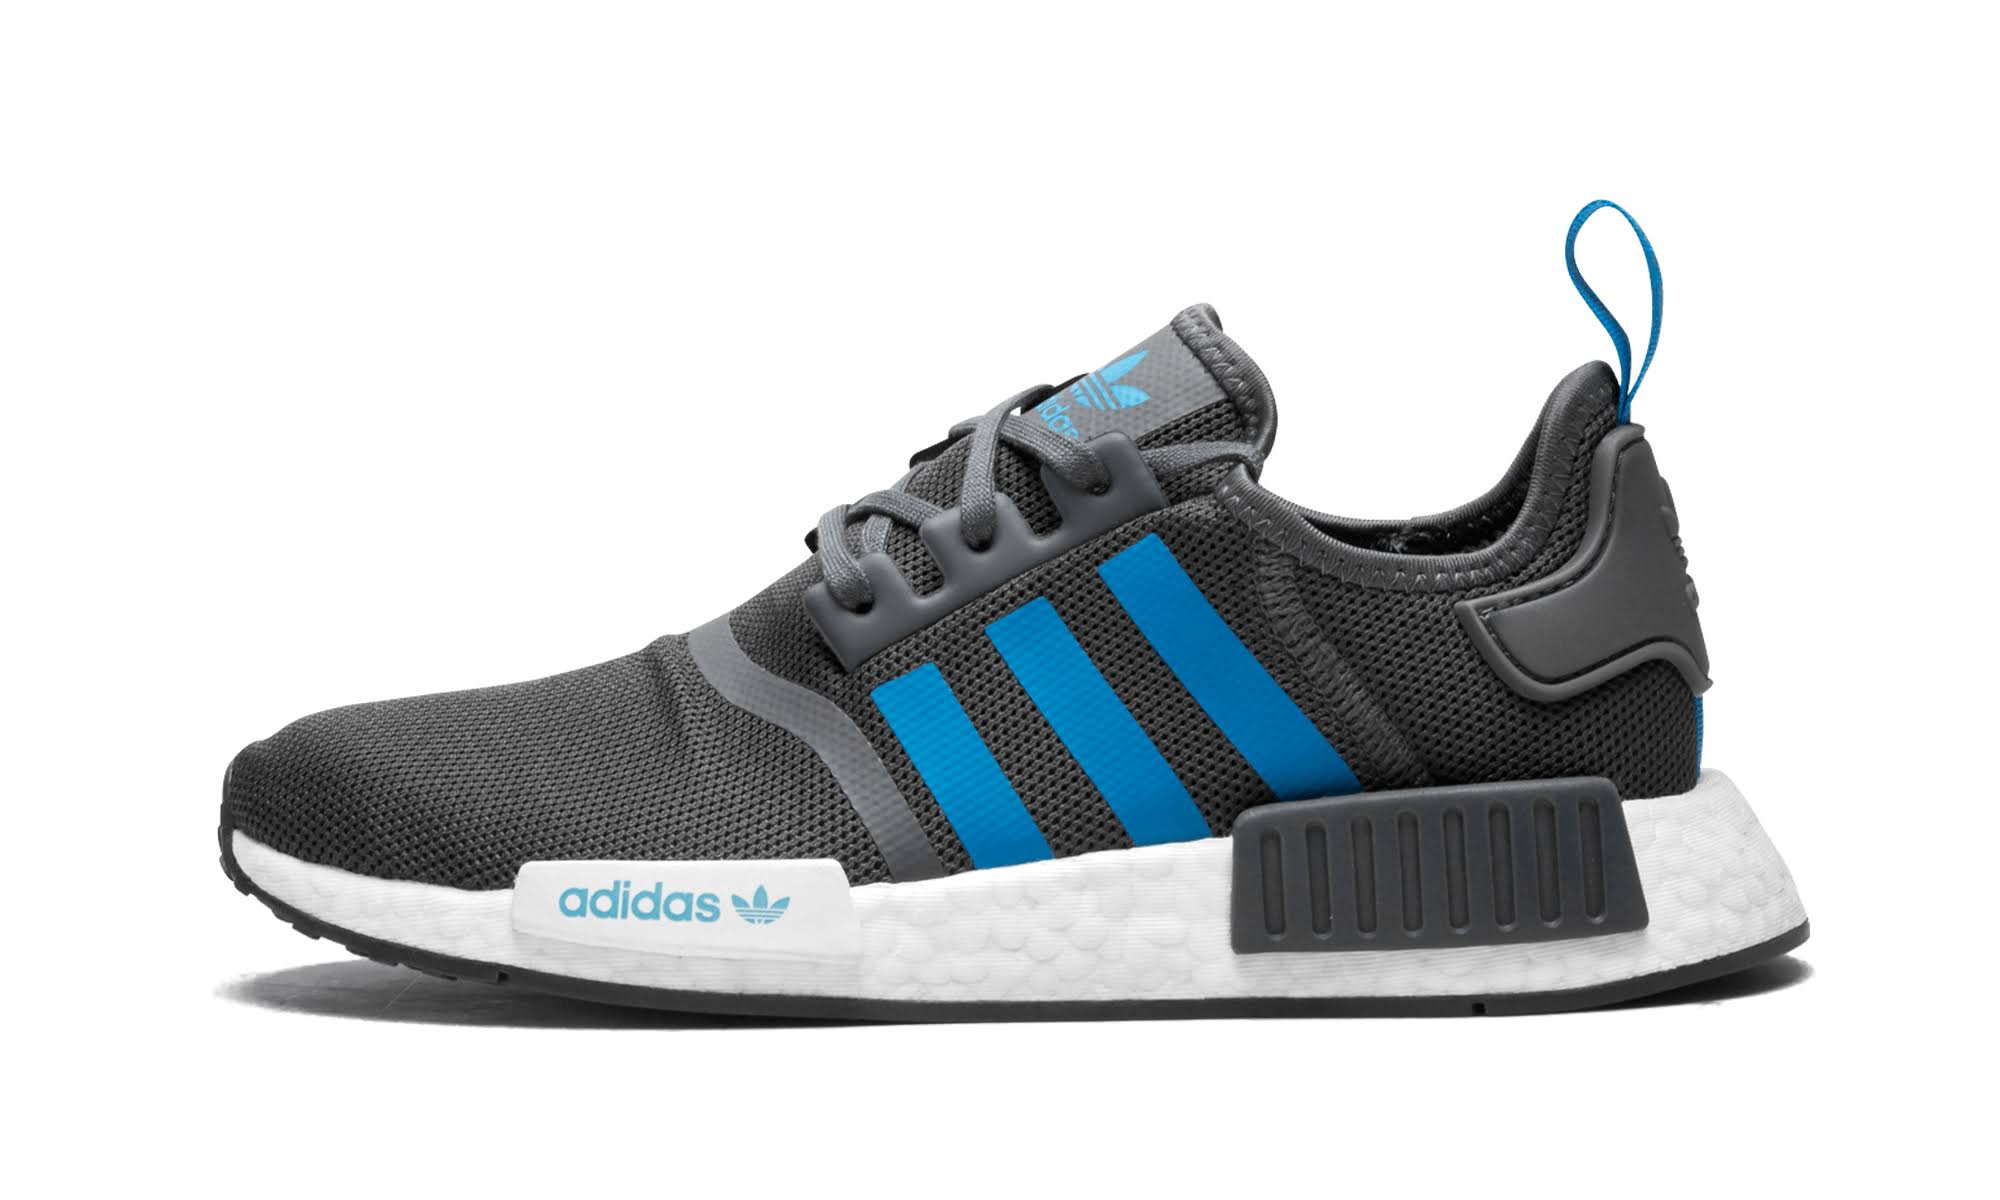 Zapatos Big Nmd Blanco Azul Kids Adidas D96688 'originals Gris r1 gaUgOqr1